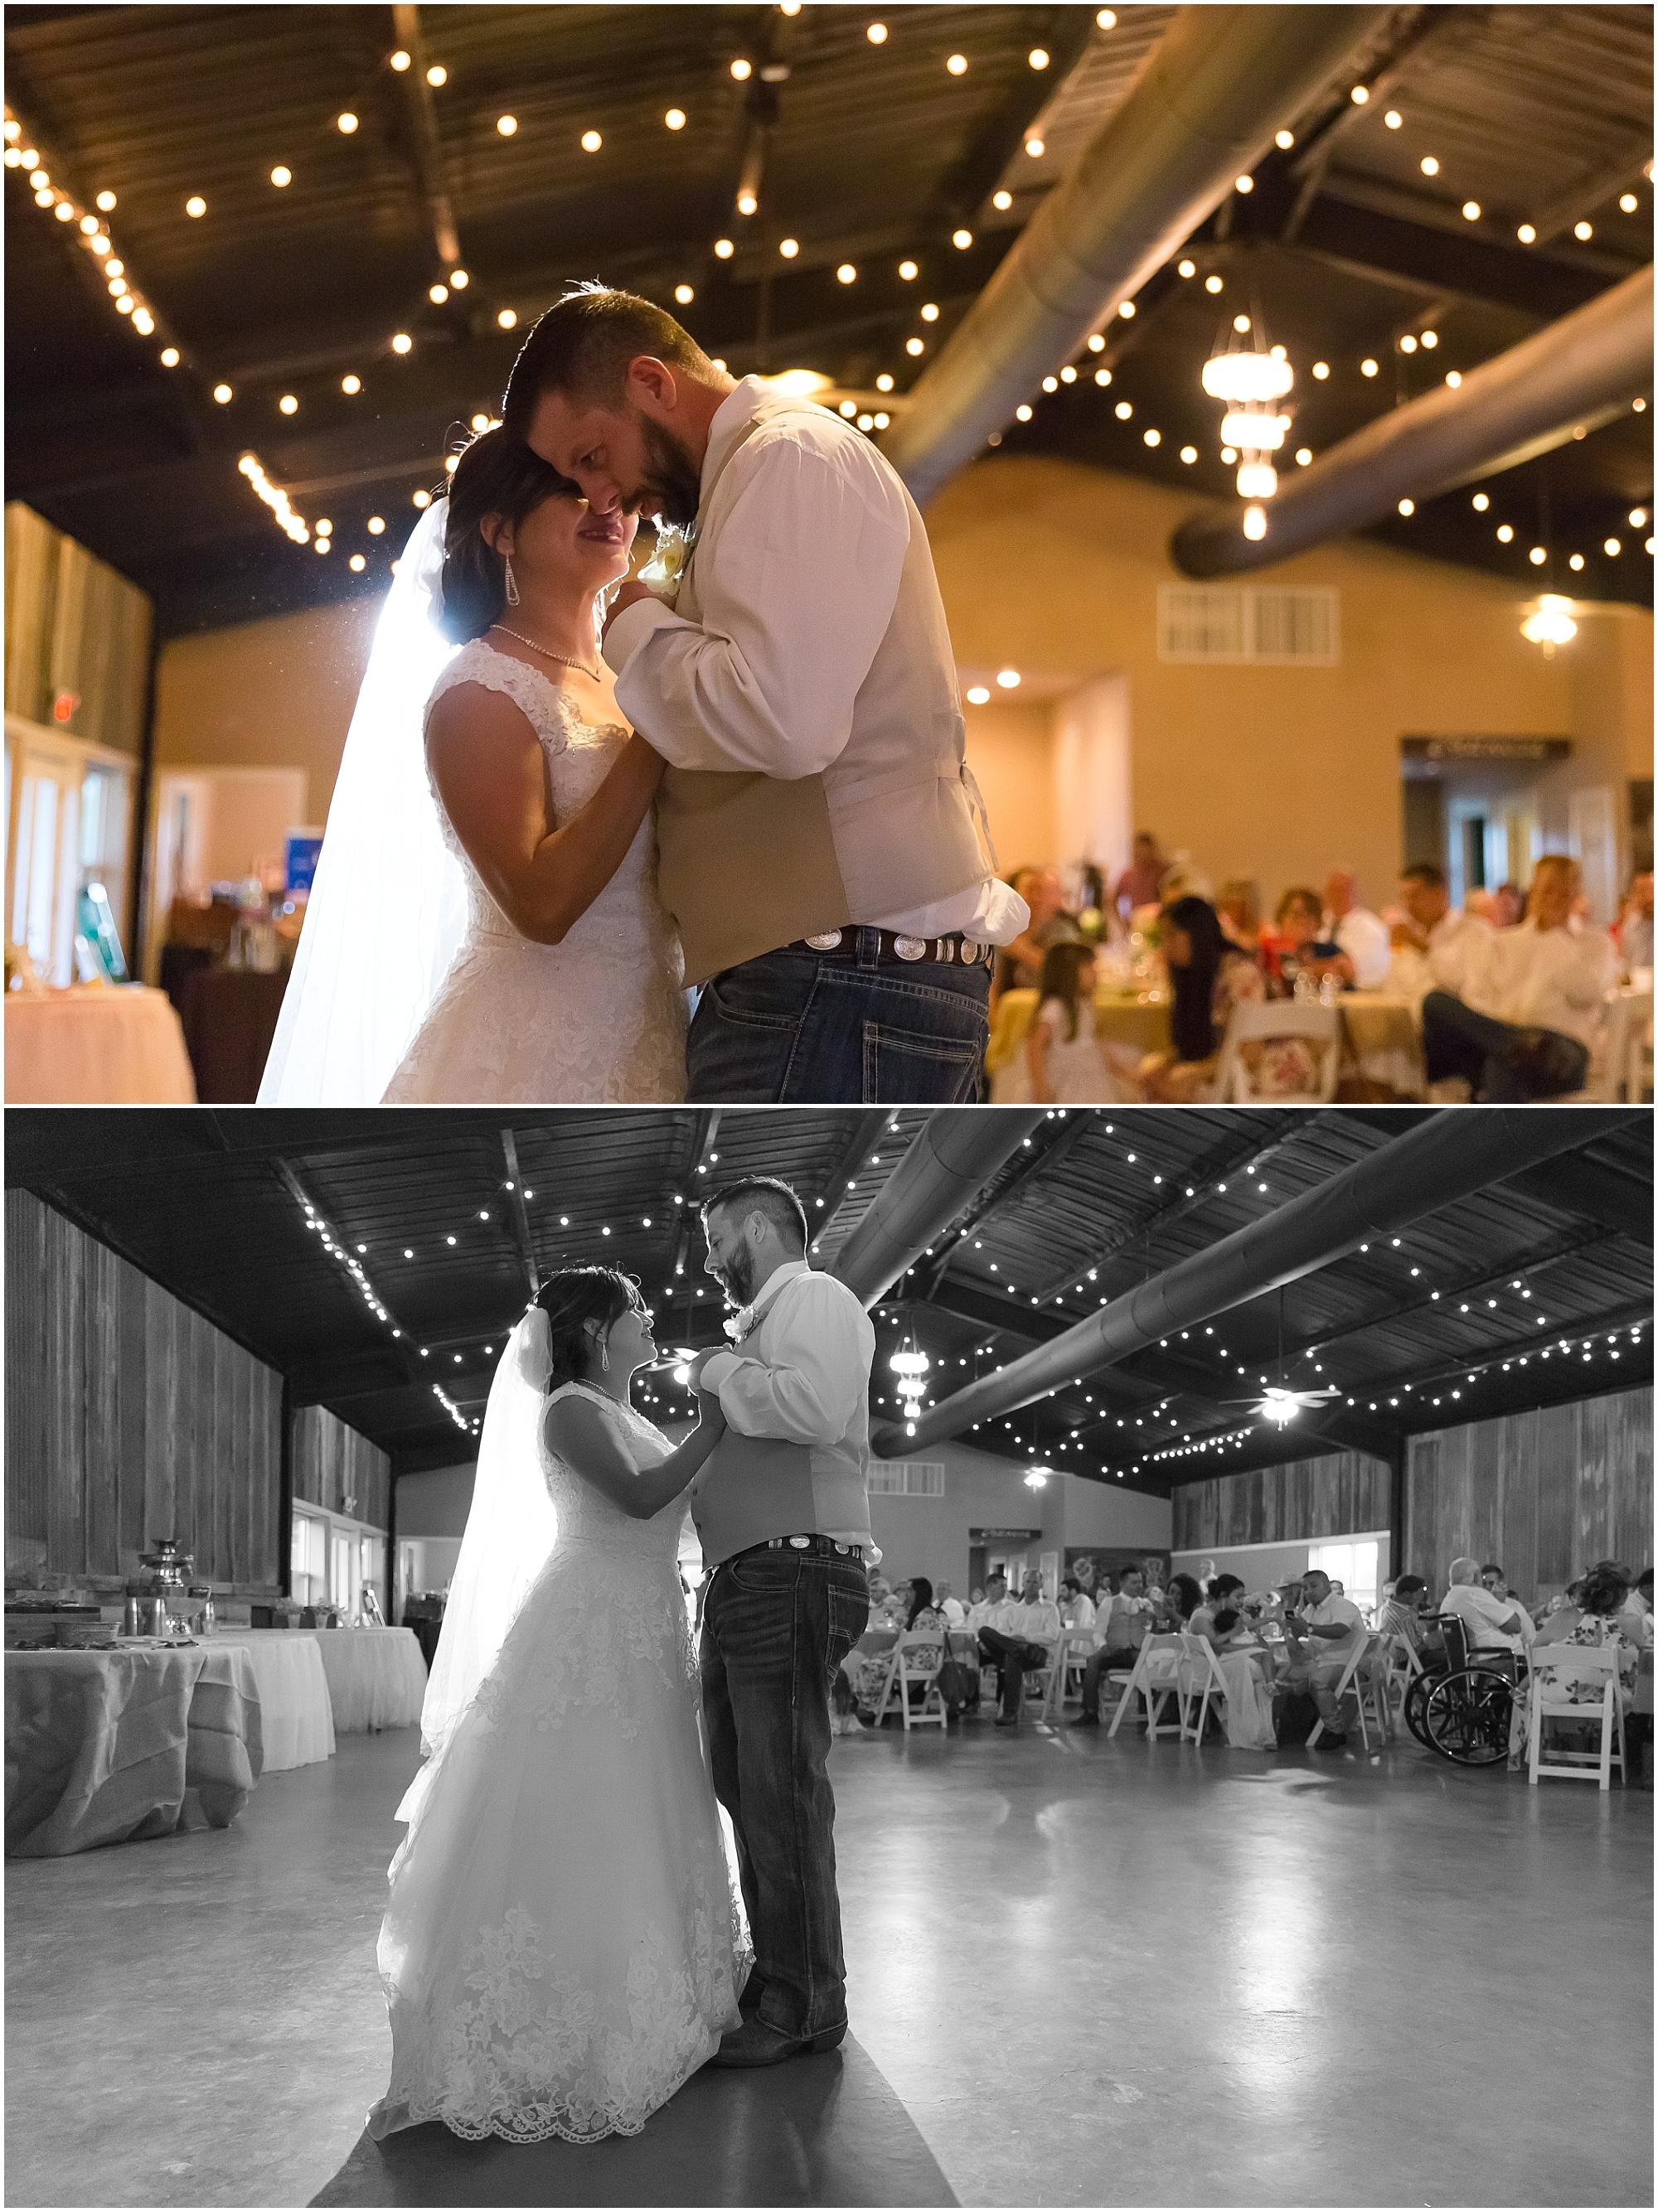 Waco Texas wedding photographer -Rustic wedding at Rustic Acres in Belton, Texas - Jason & Melaina Photography - www.jasonandmelaina.com